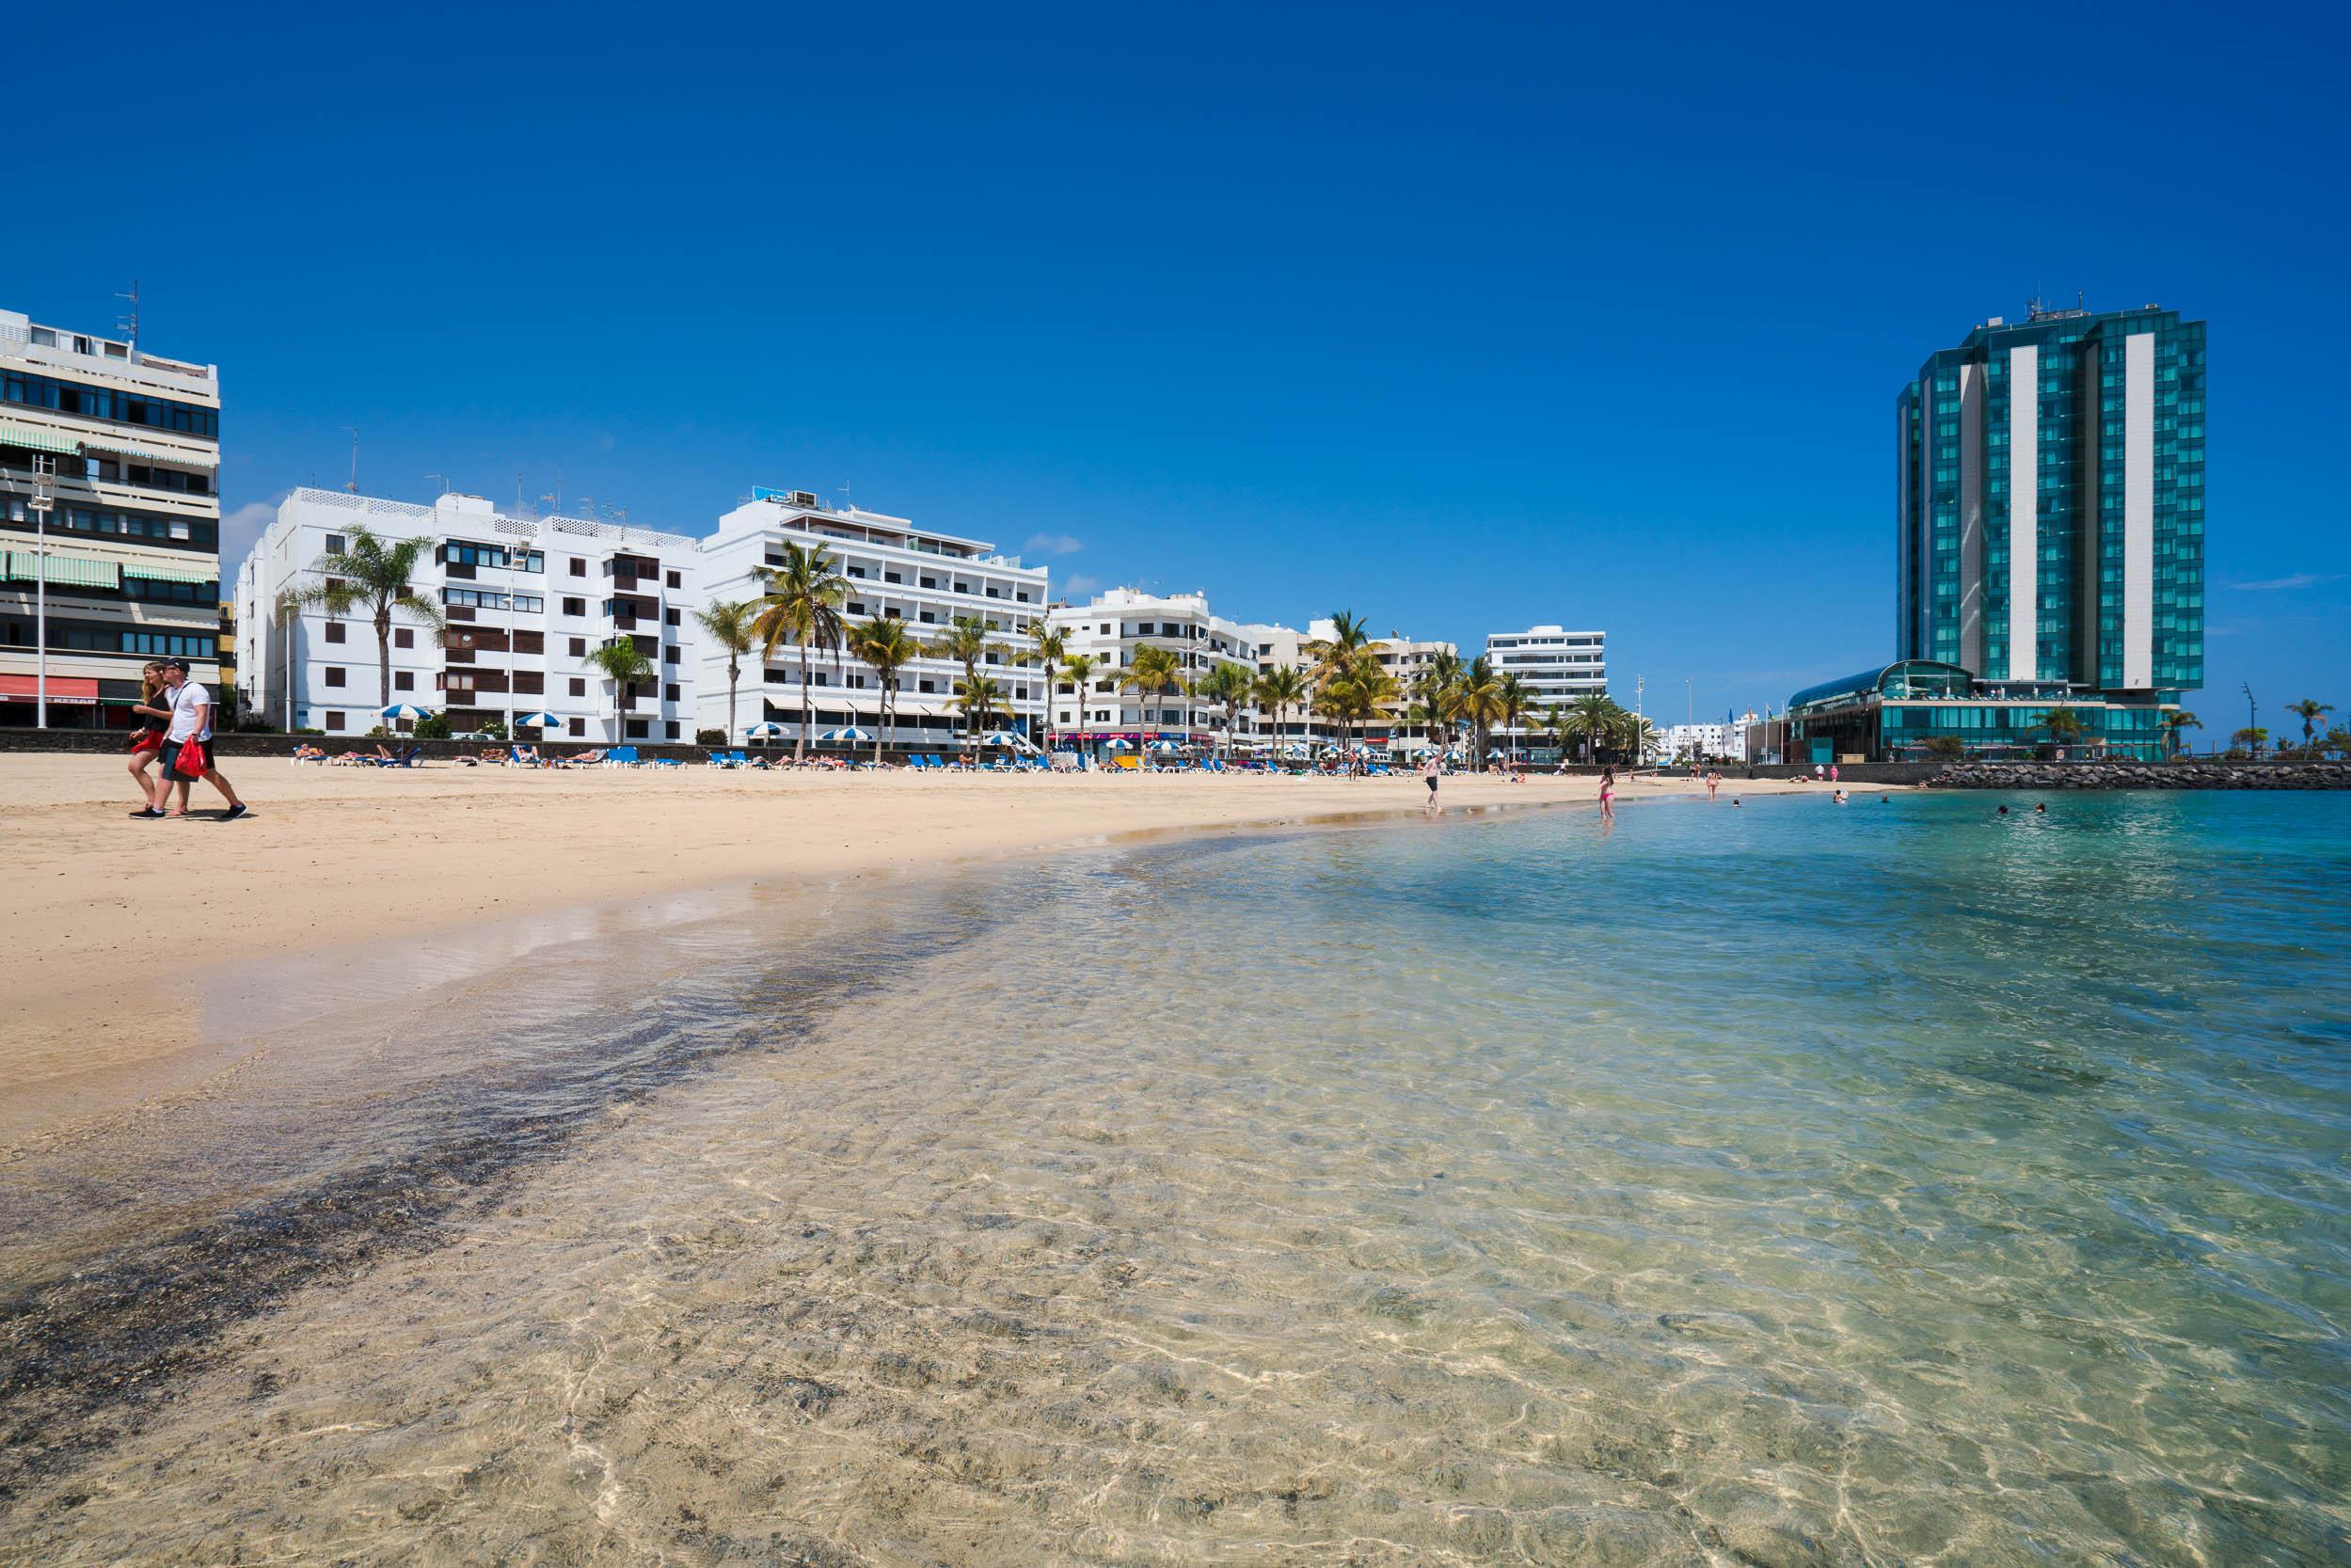 Lanzarote - lungomare